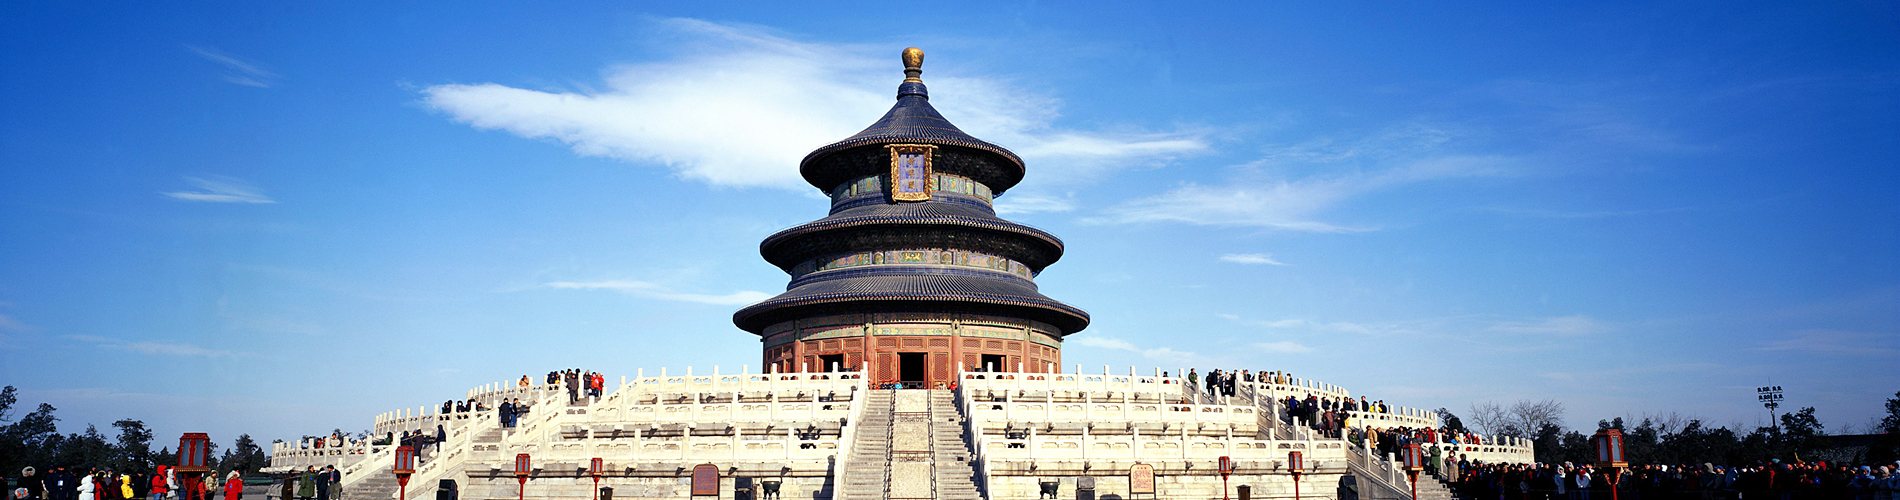 Beijing-1900.jpg